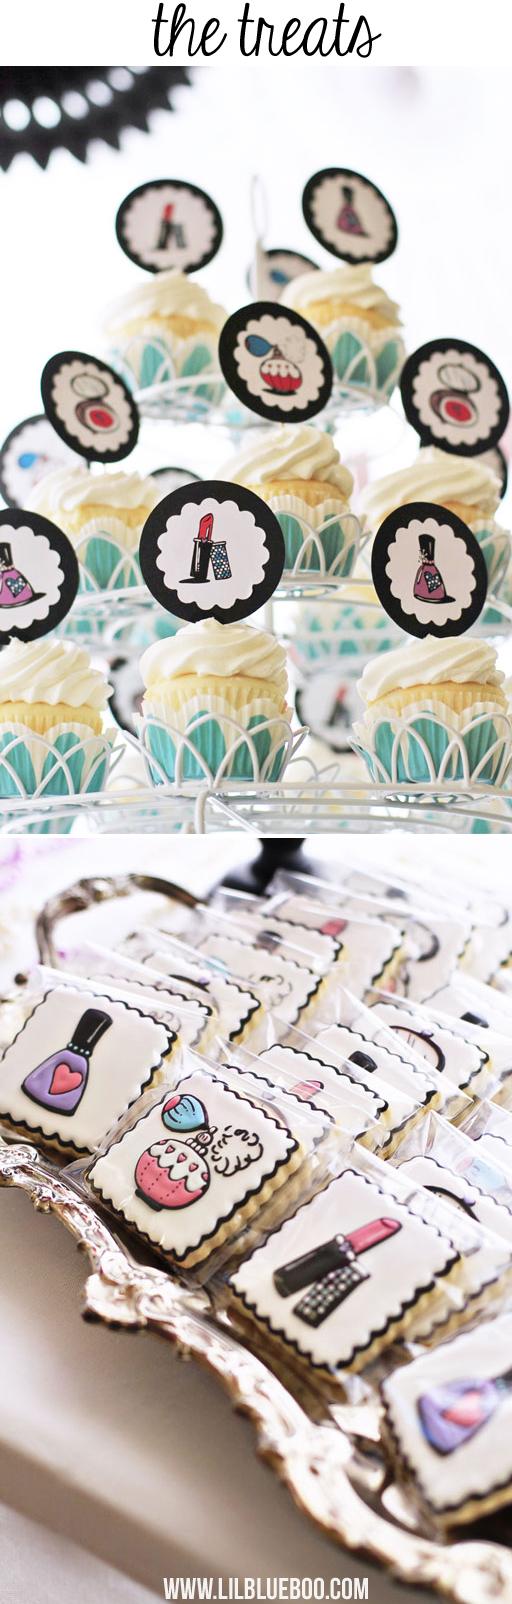 Beauty Salon Party Printables and Supplies via lilblueboo.com #printable #party #americangirl